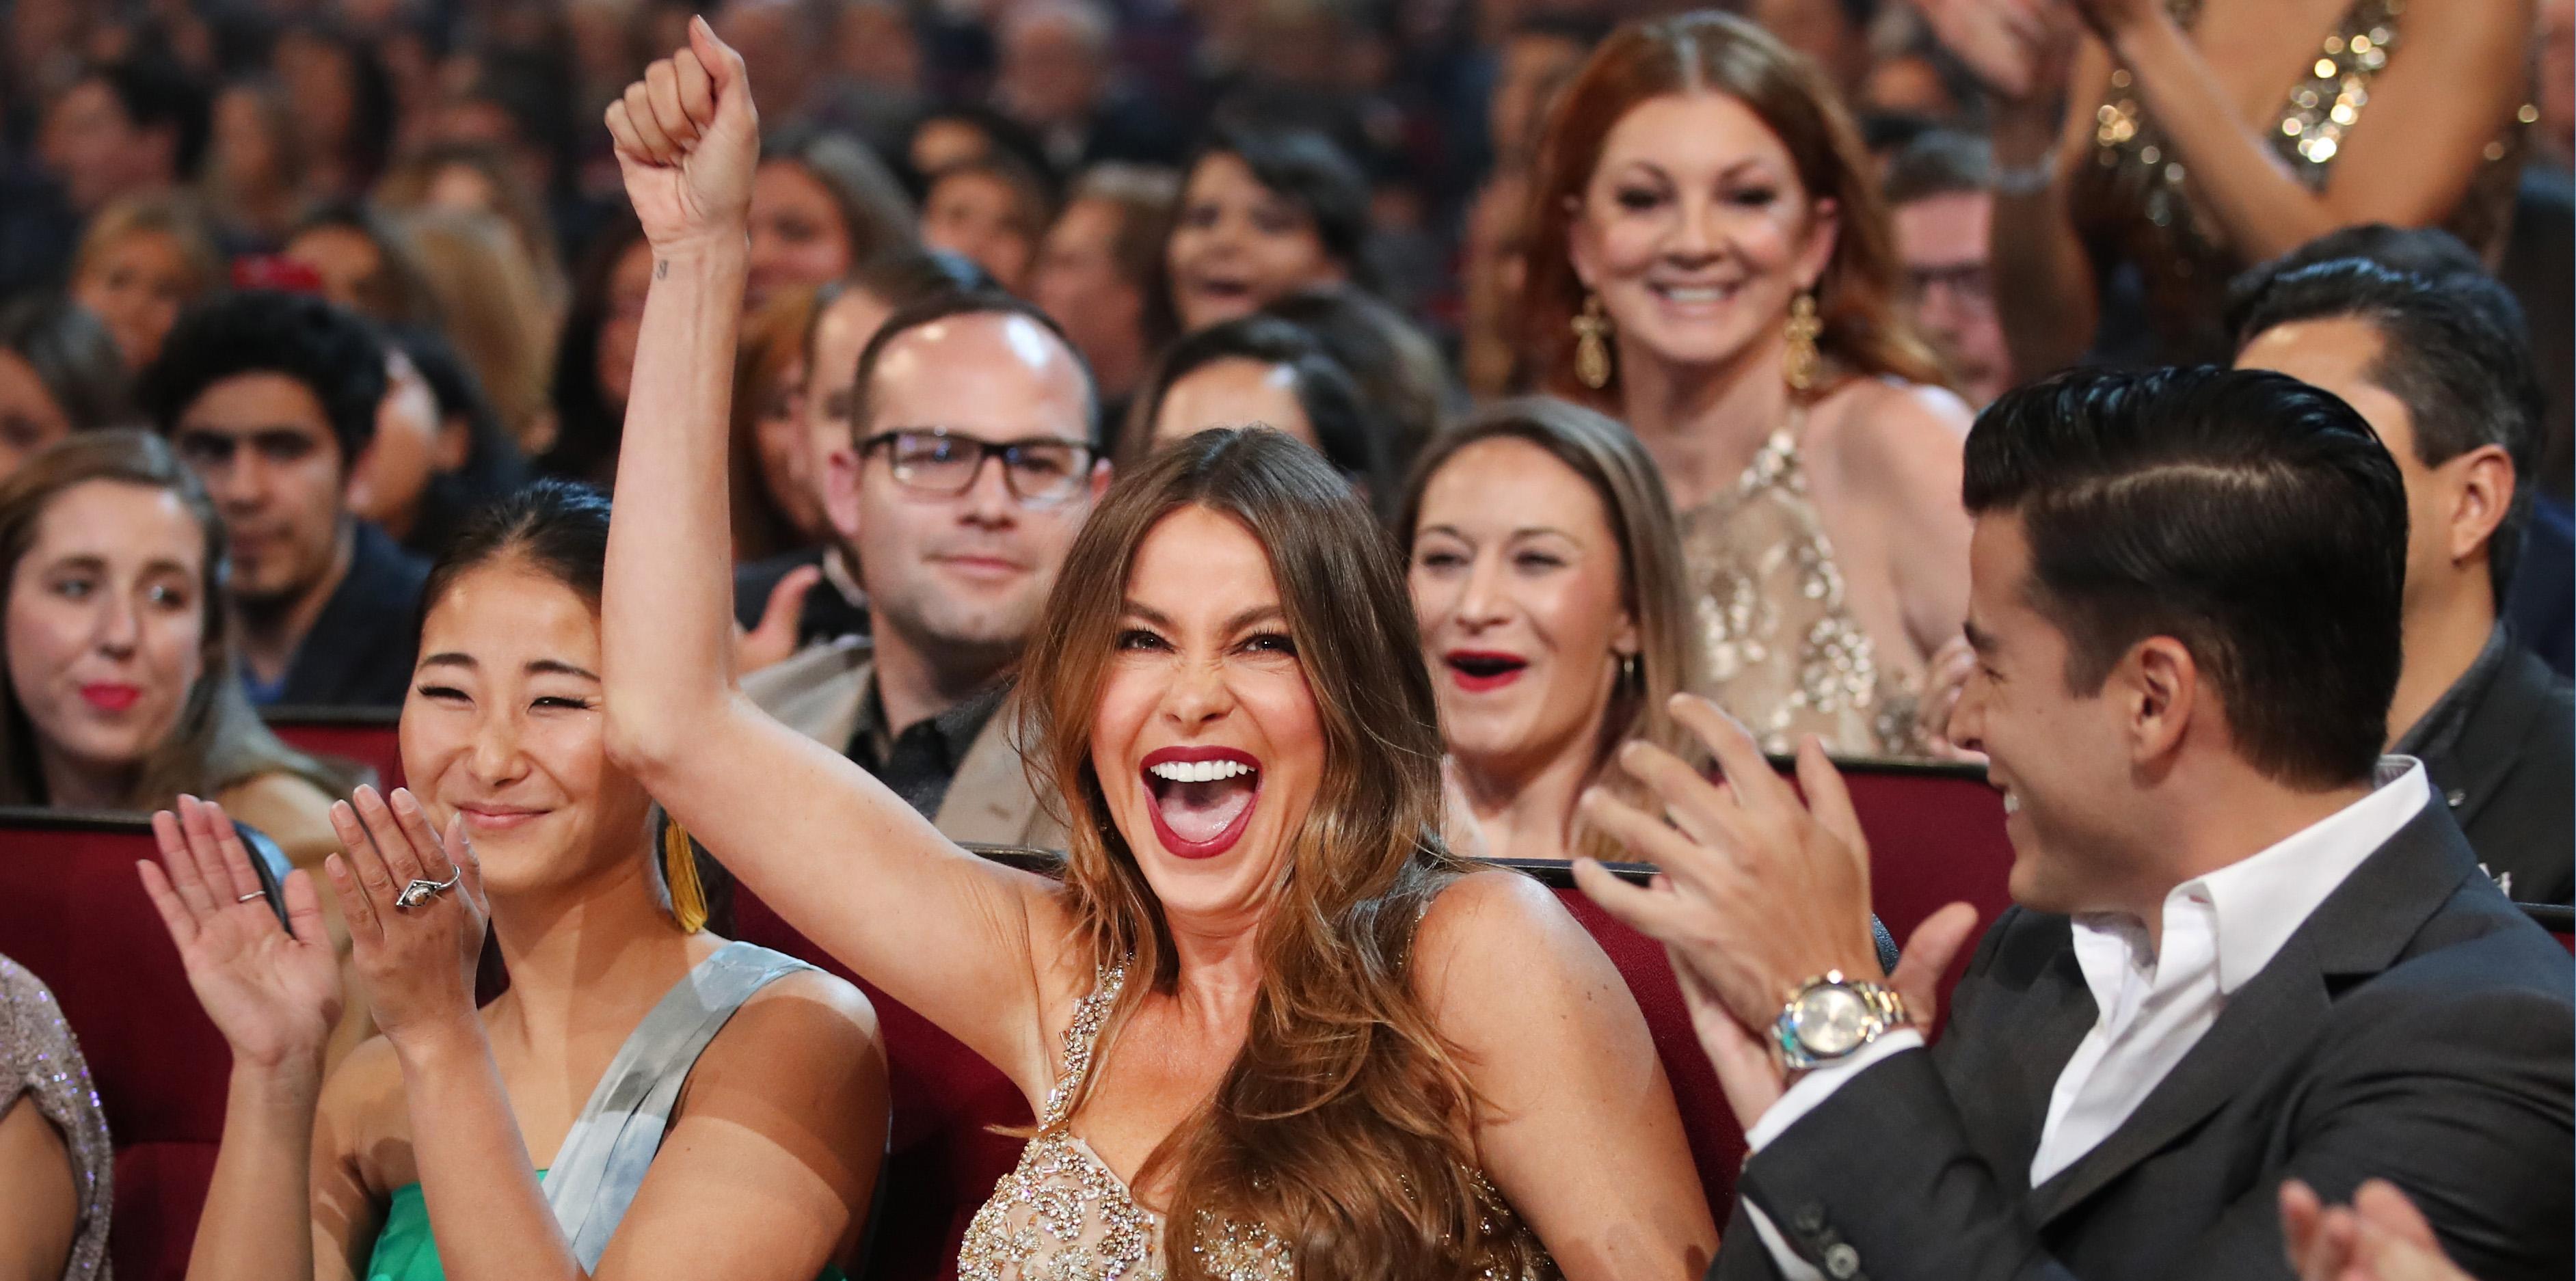 People's Choice Awards 2017 – Show